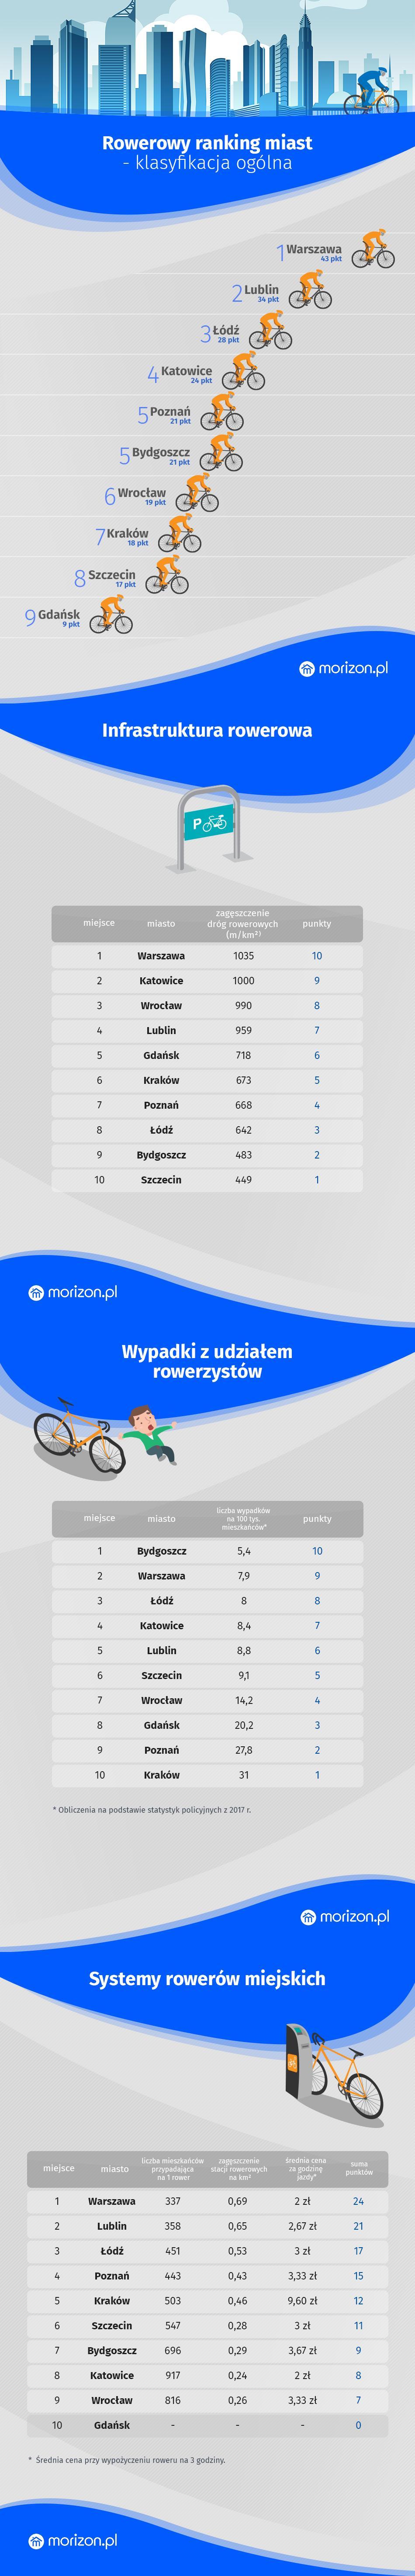 Rowerowy ranking polskich miast, Morizon.pl